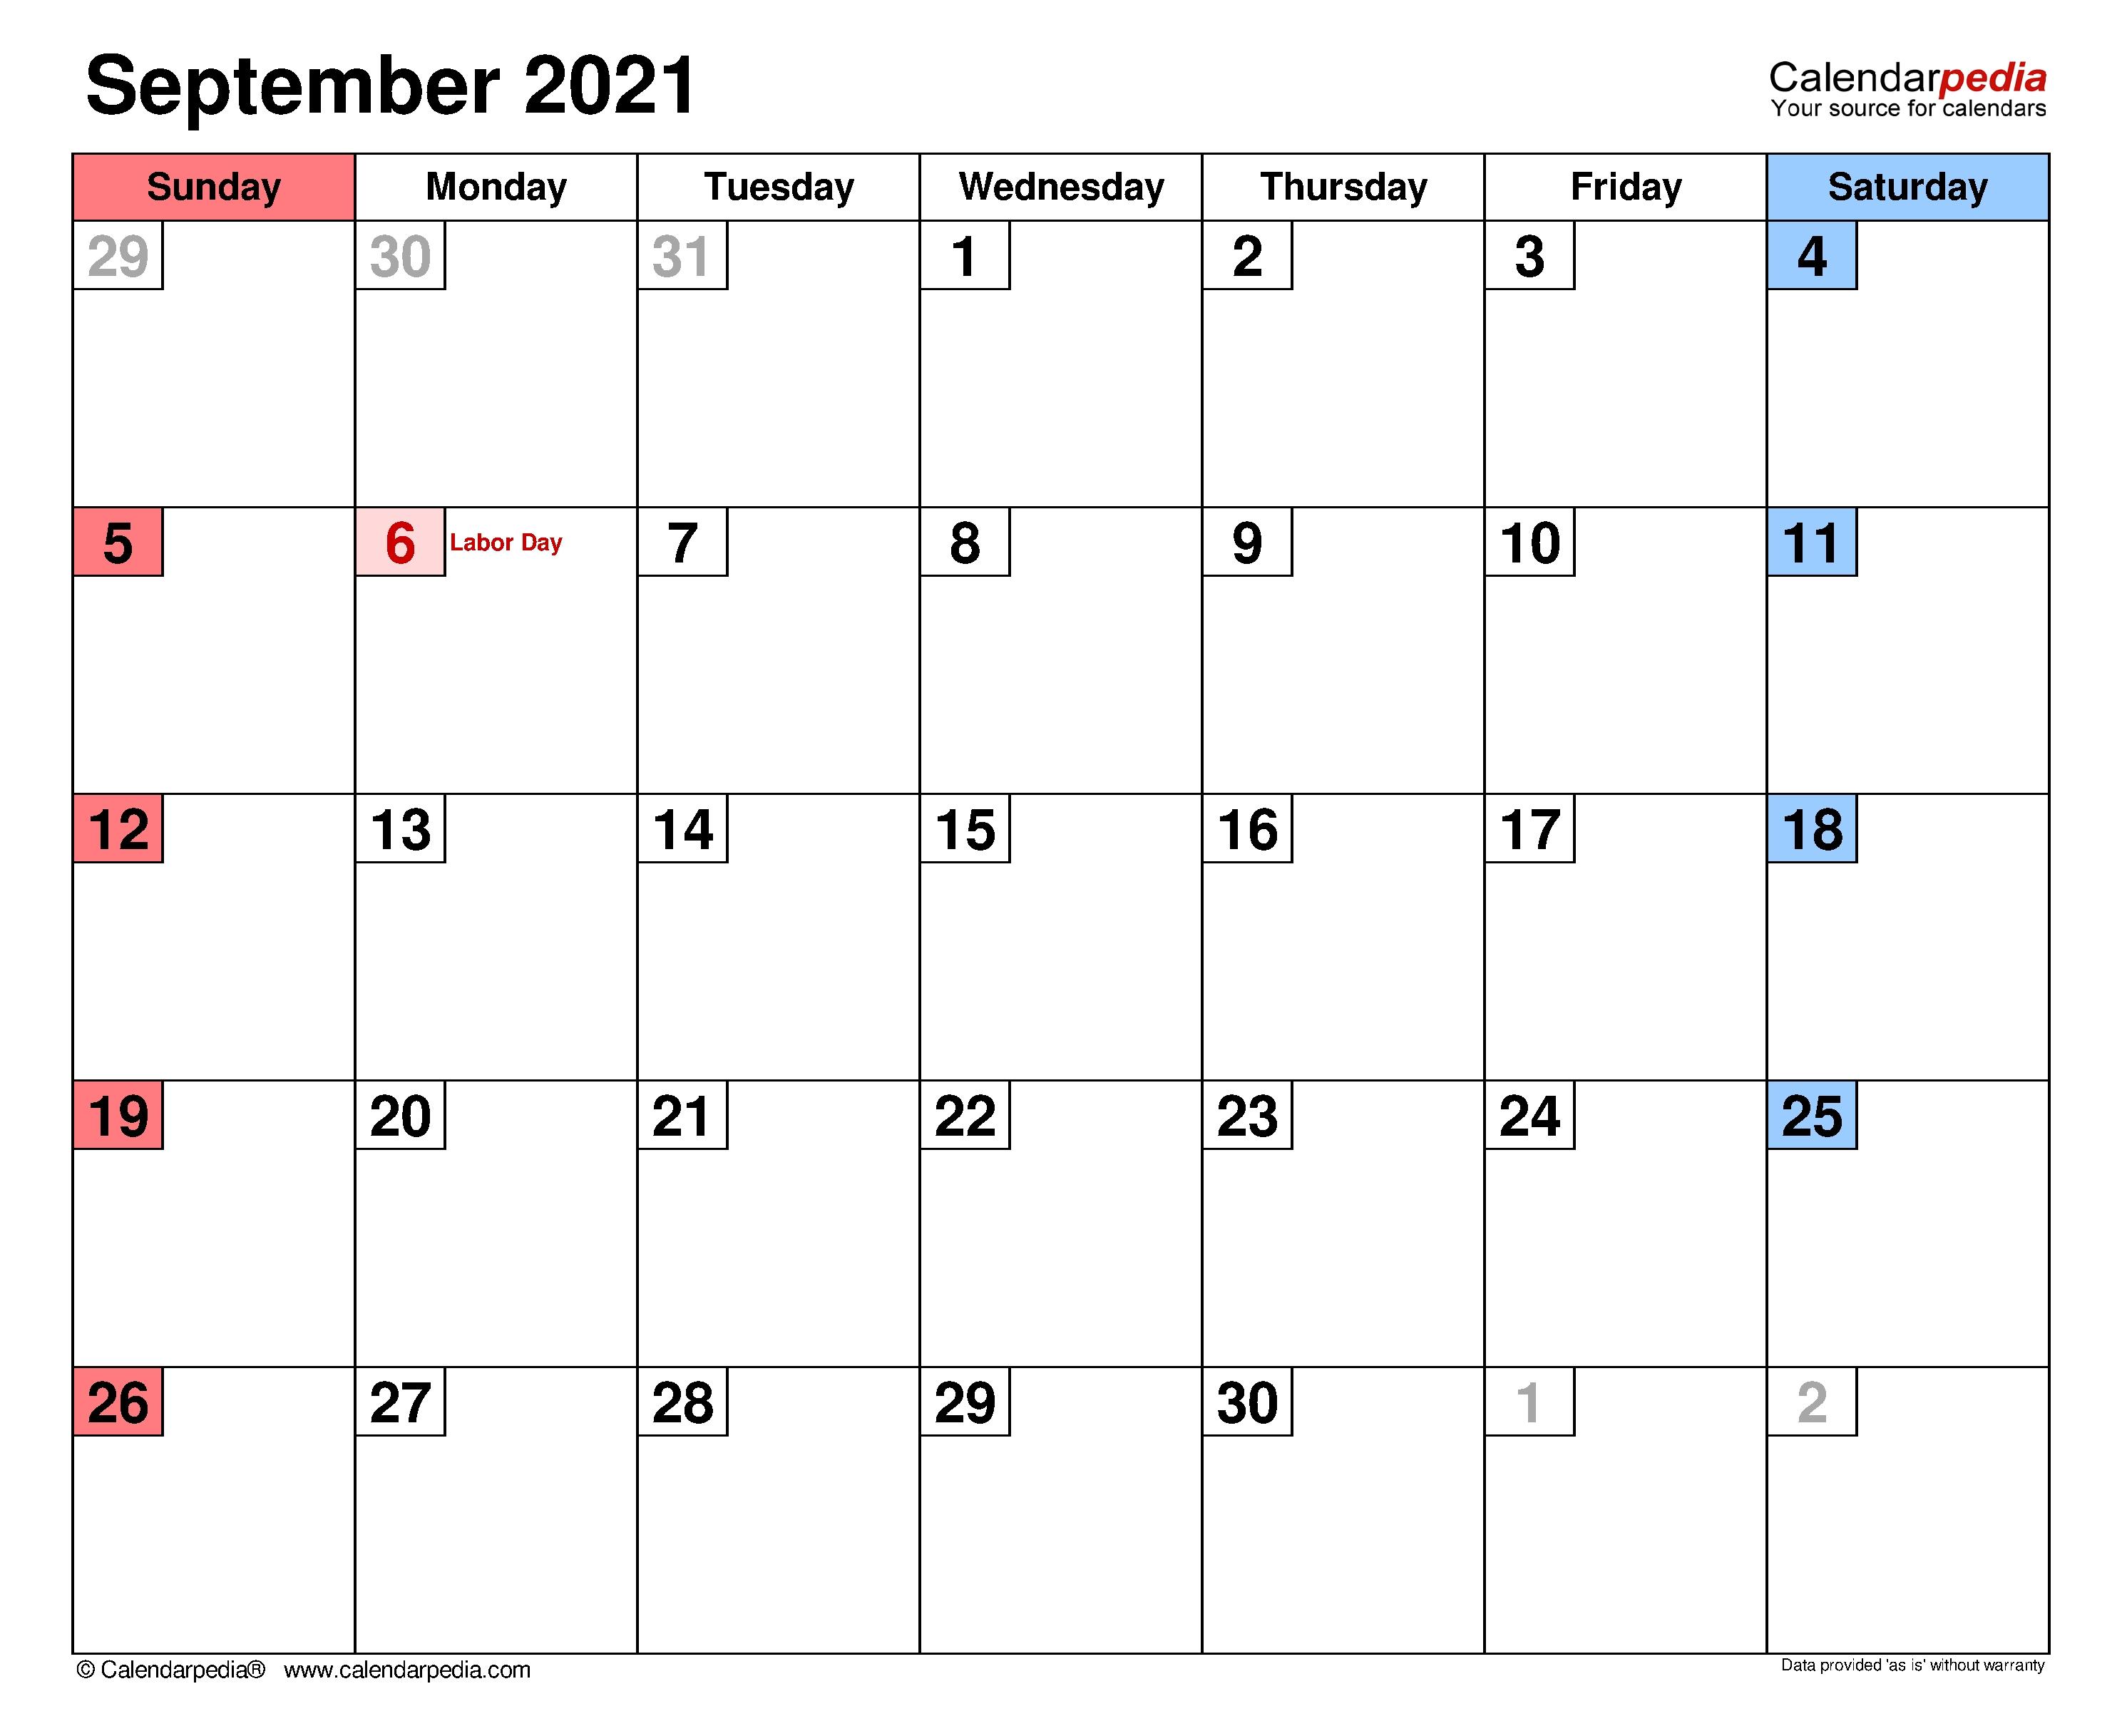 September 2021 Calendar | Templates For Word, Excel And Pdf Printable Calendar September 2020 To September 2021